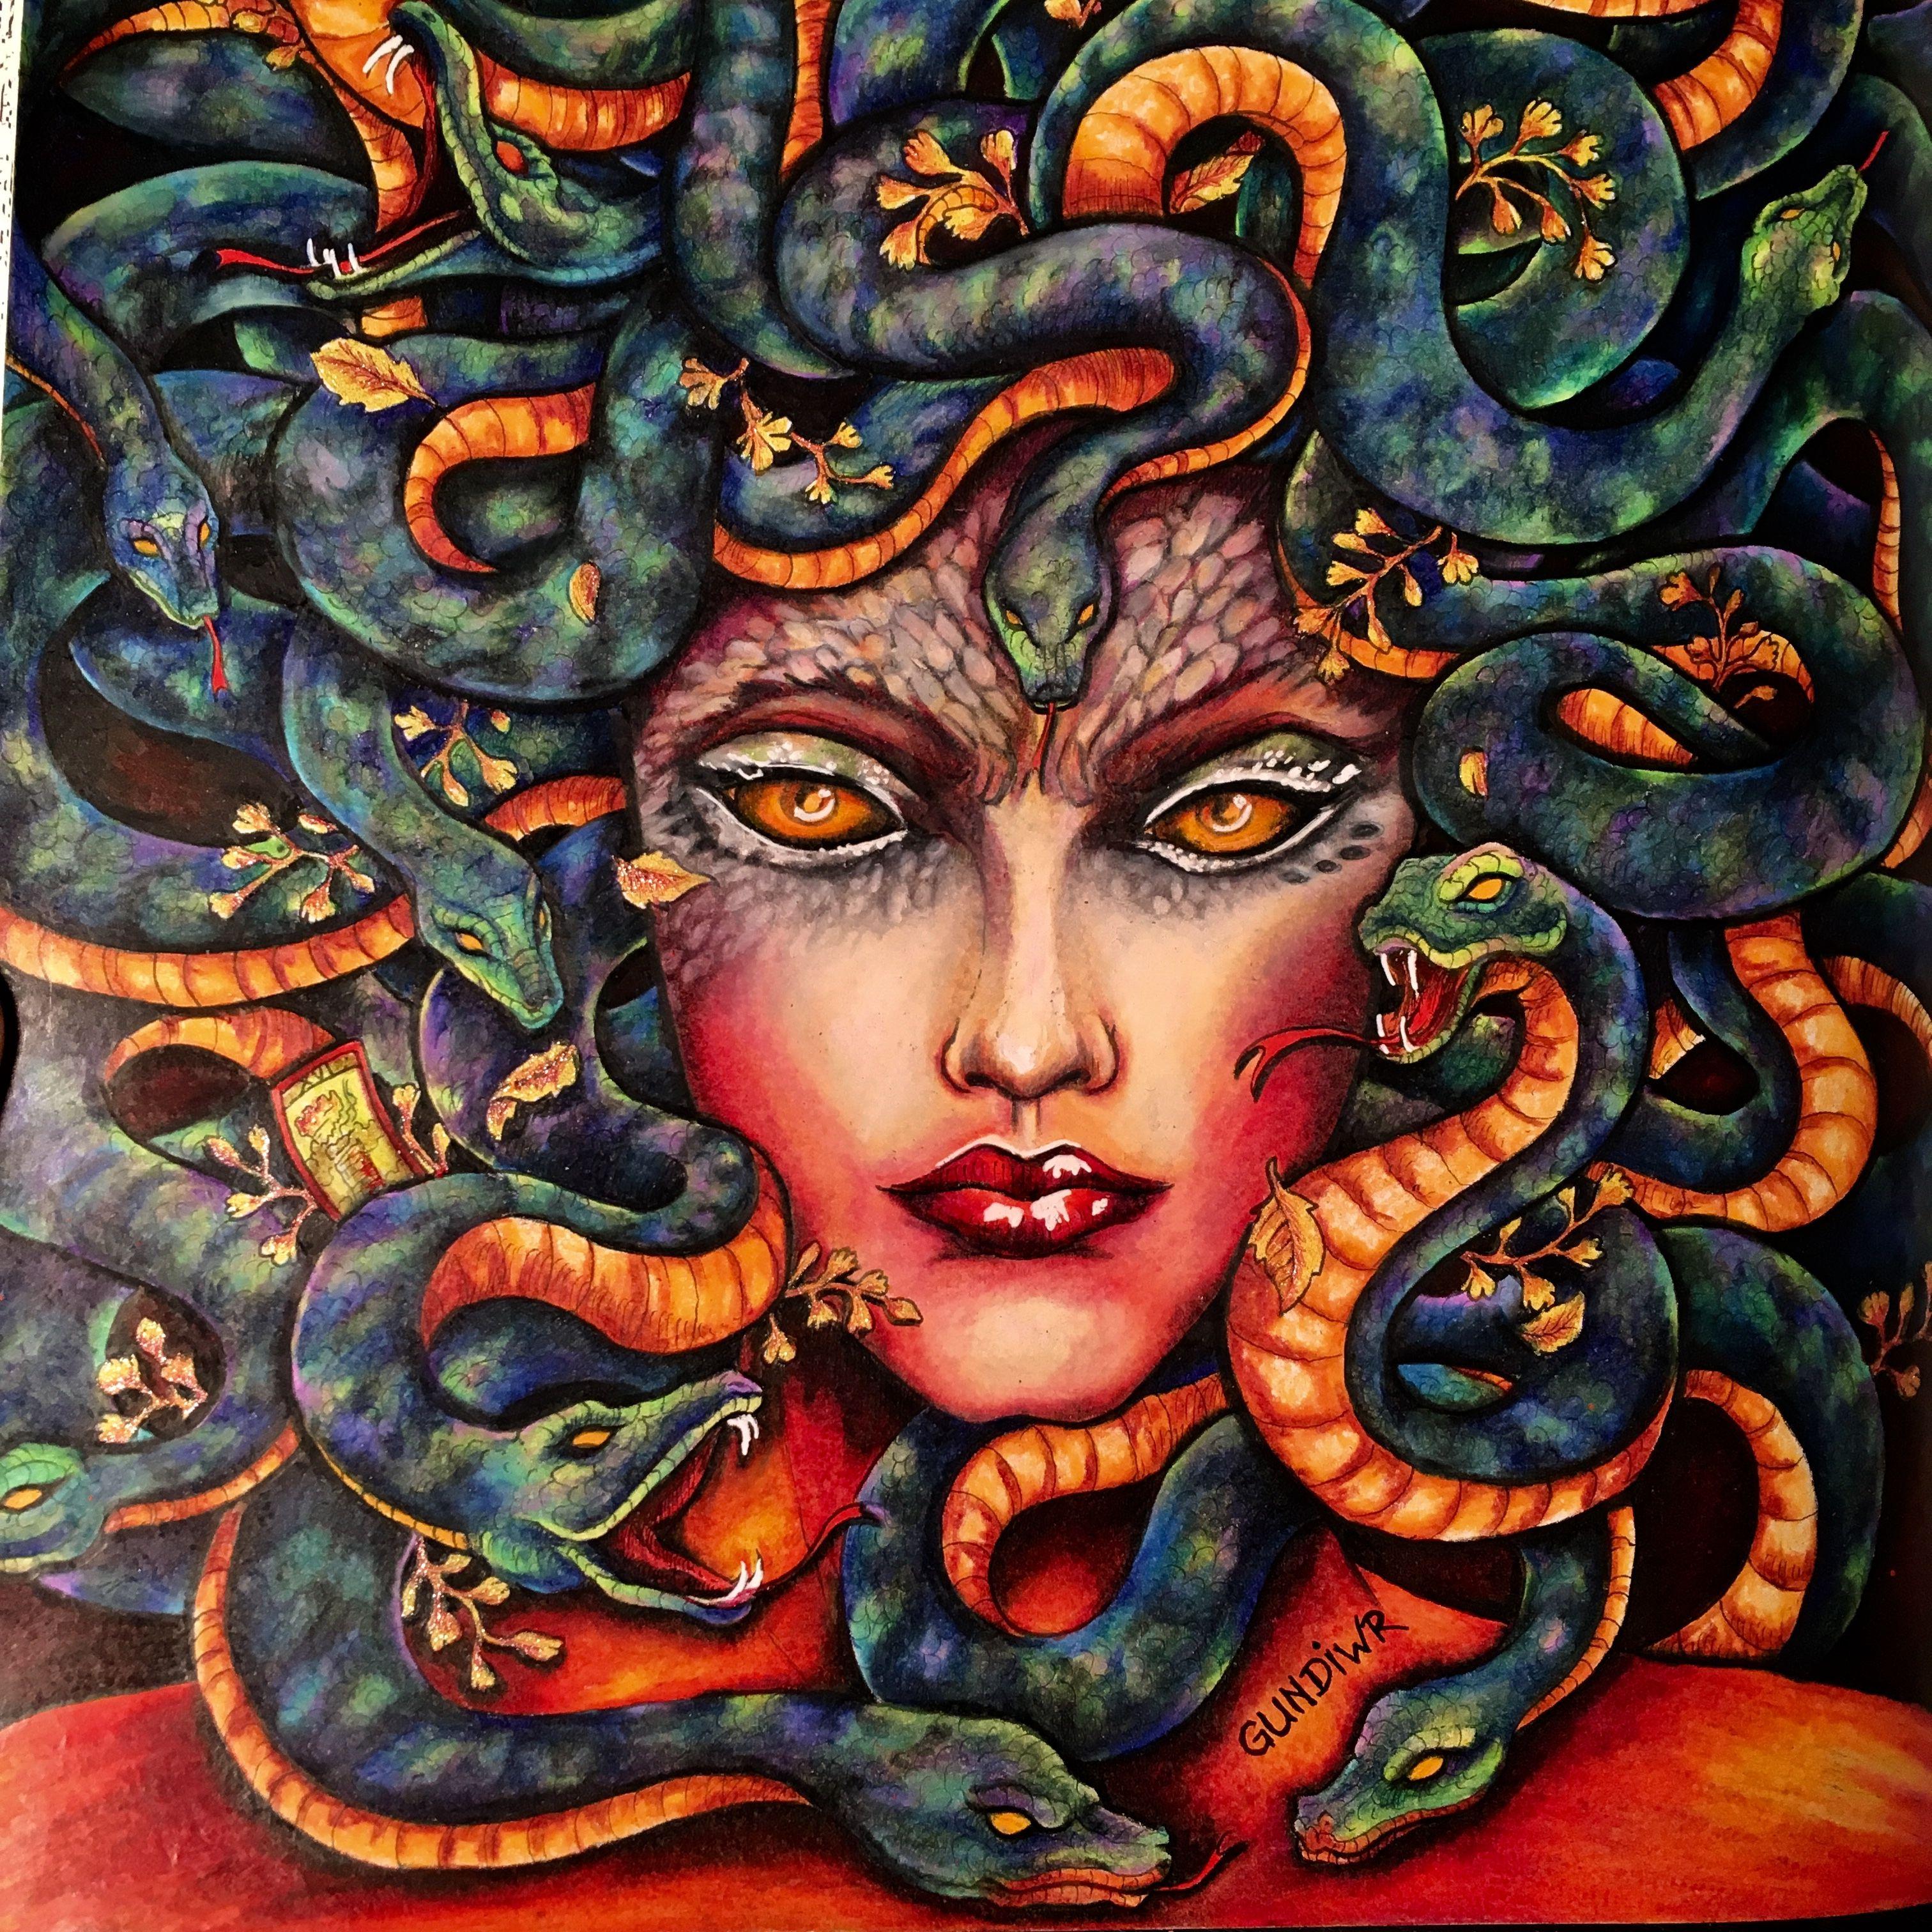 Medusa Mythomorphia Kerby Rosanes Colored By Gundiwr Coloring Book Art Animorphia Coloring Book Animorphia Coloring